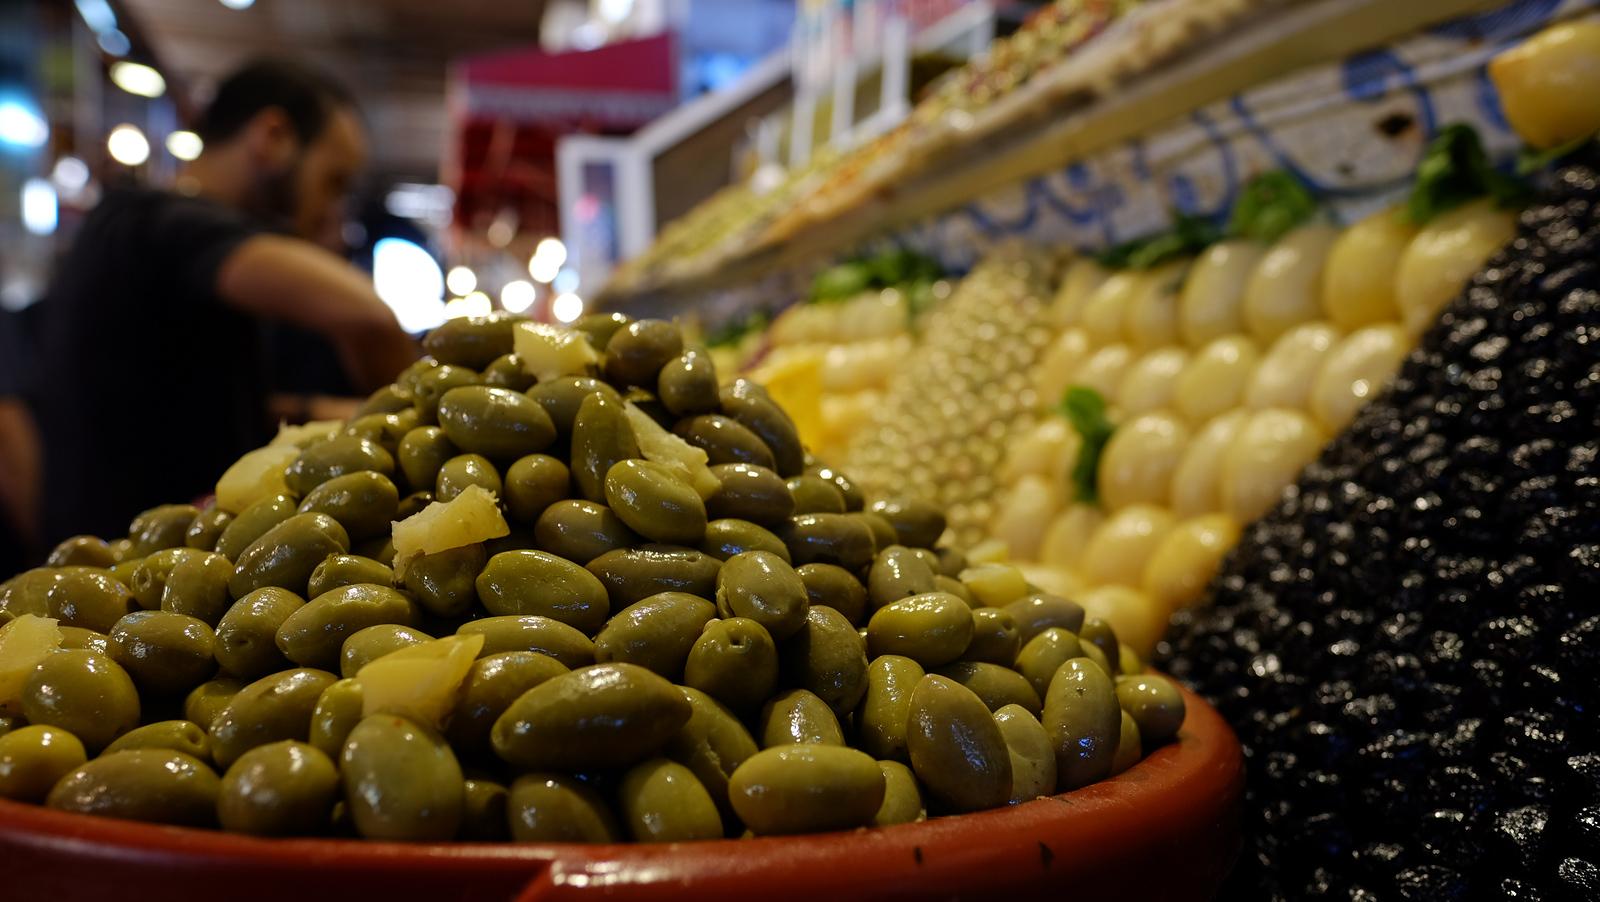 Fujifilm xf16mm olives morocco